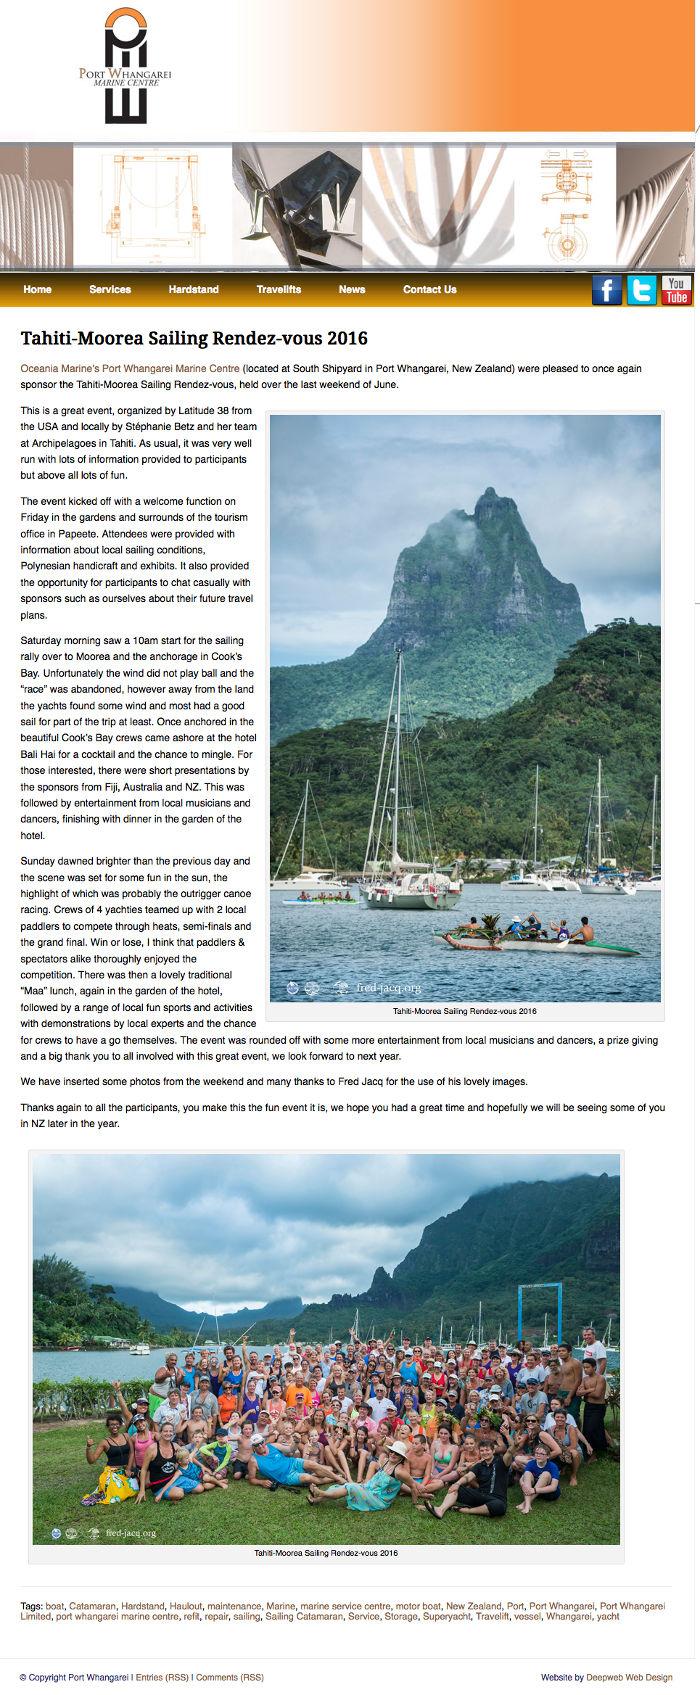 Tahiti-Moorea_Sailing_Rendez-vous_2016_Port_Whangarei_-_2016-07-05_14.00.17